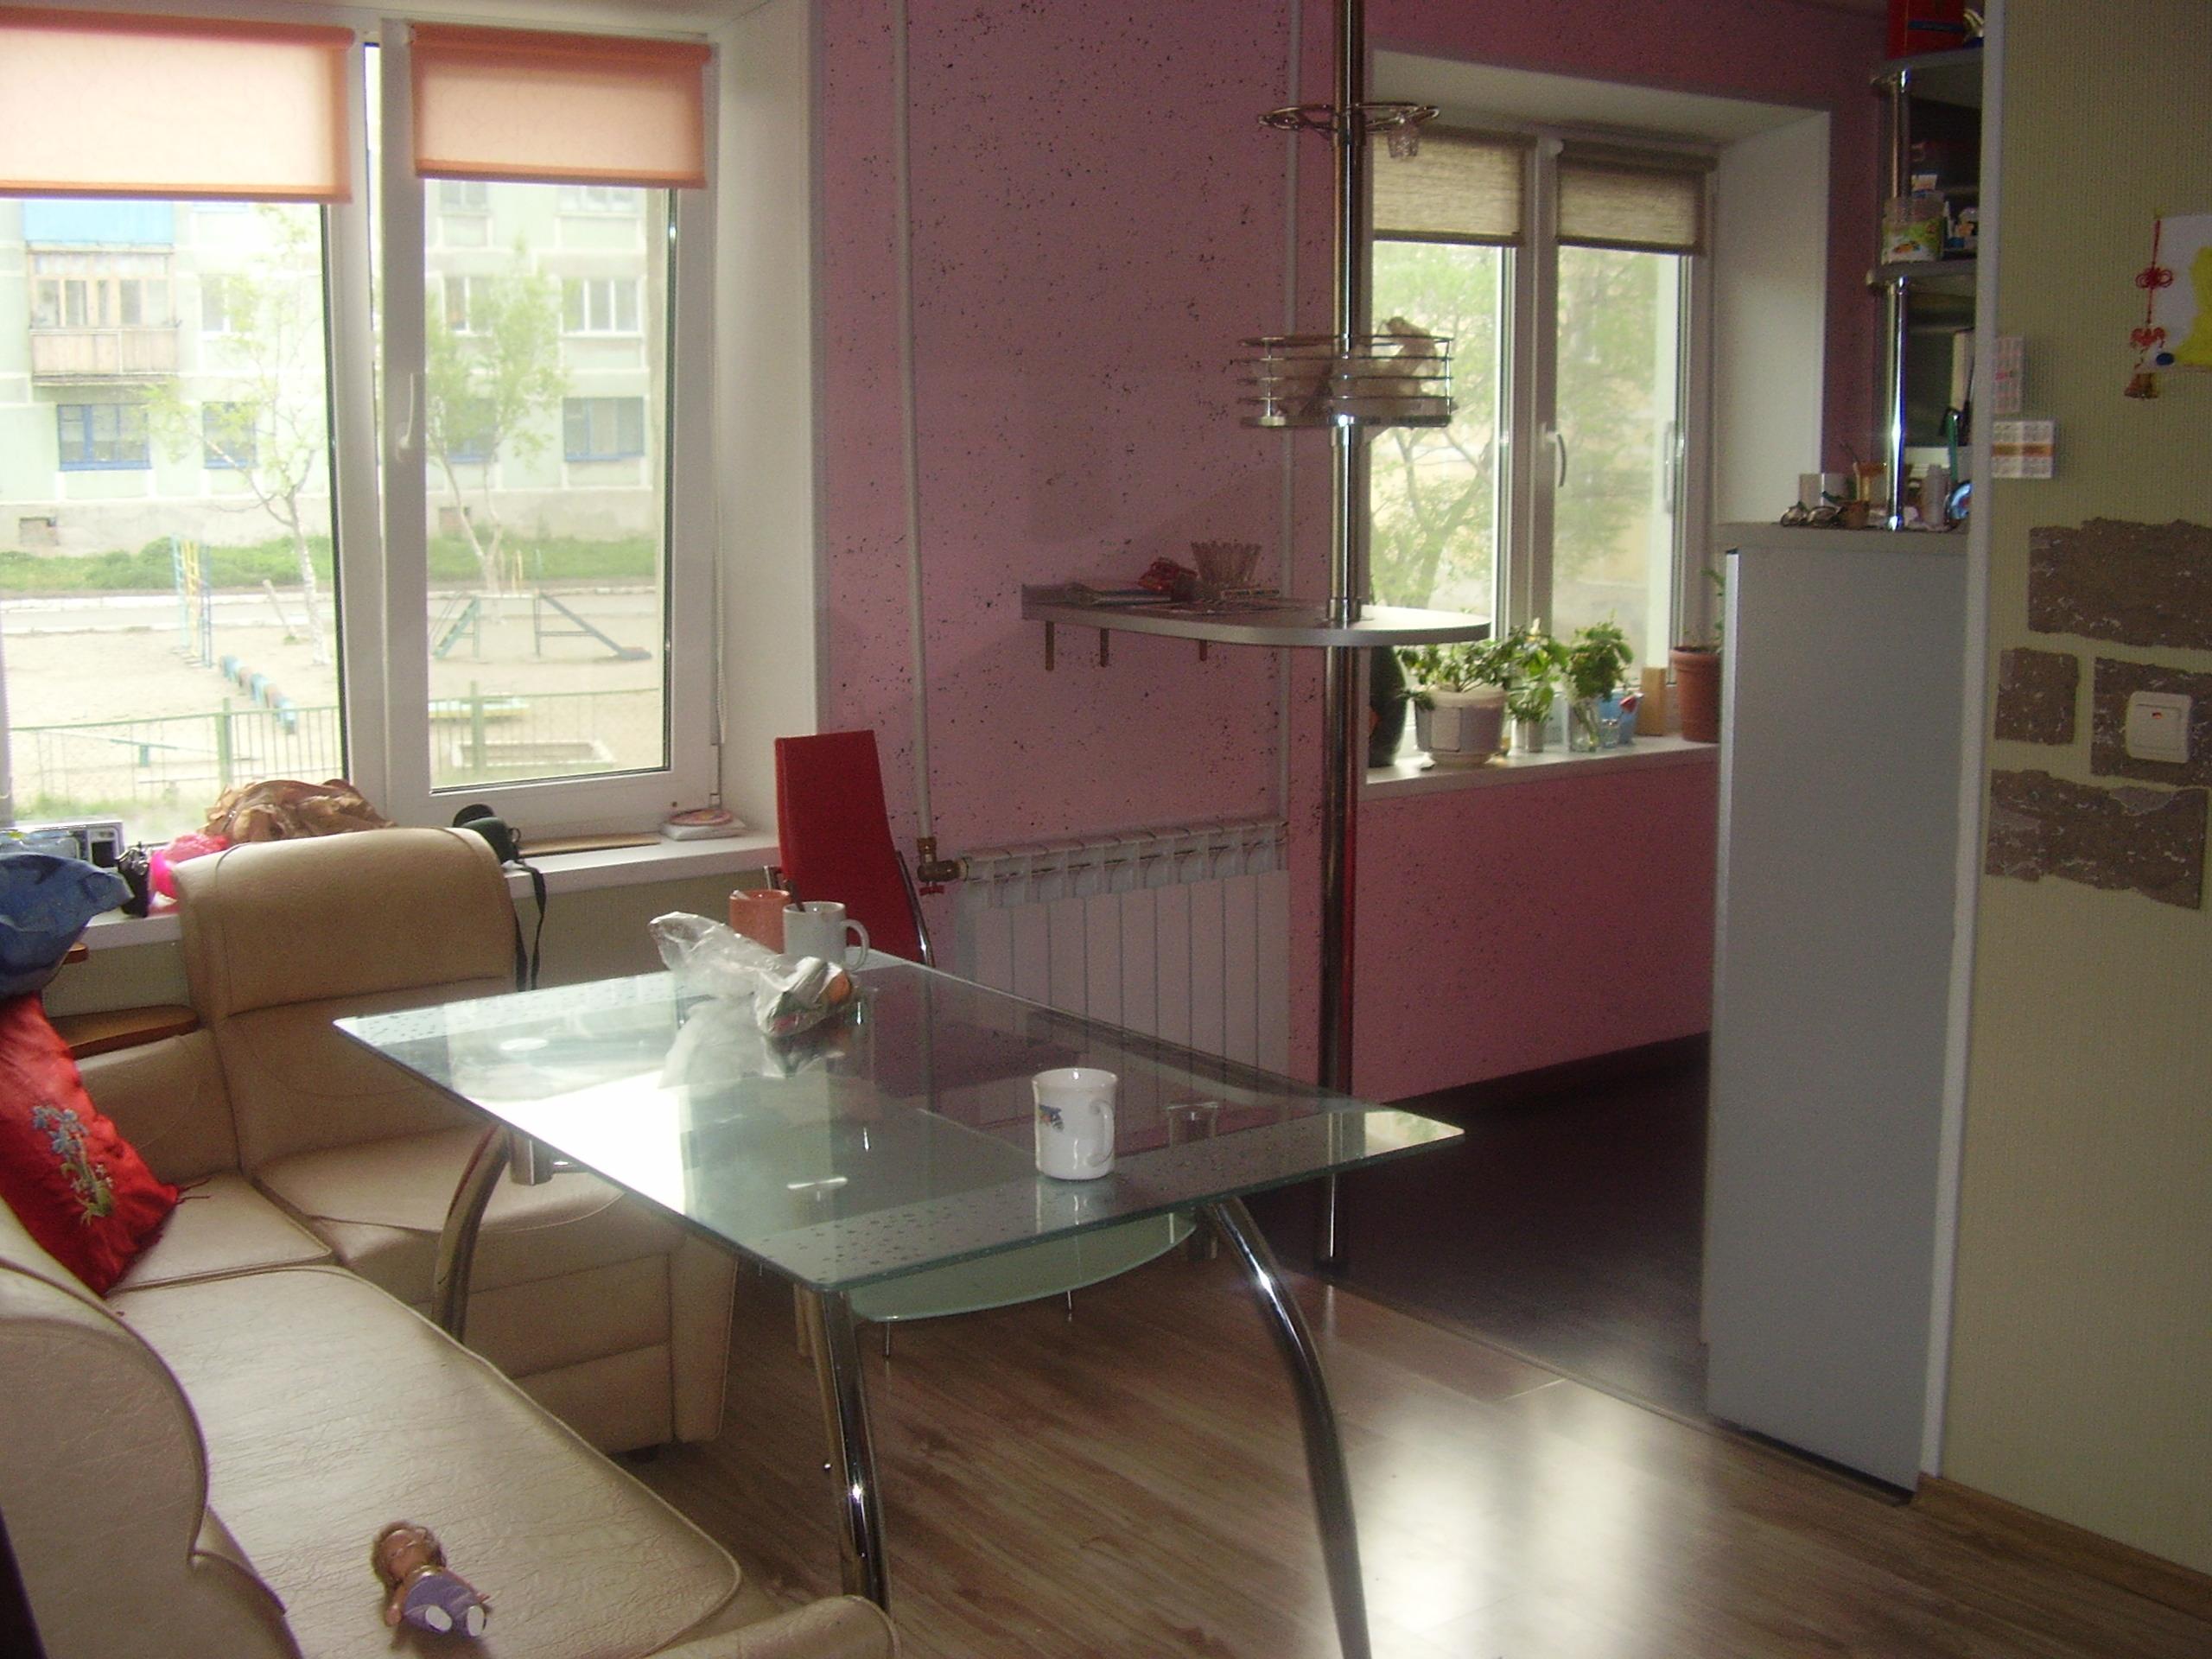 Дизайн двухкомнатной квартиры: фото интерьеров, идеи